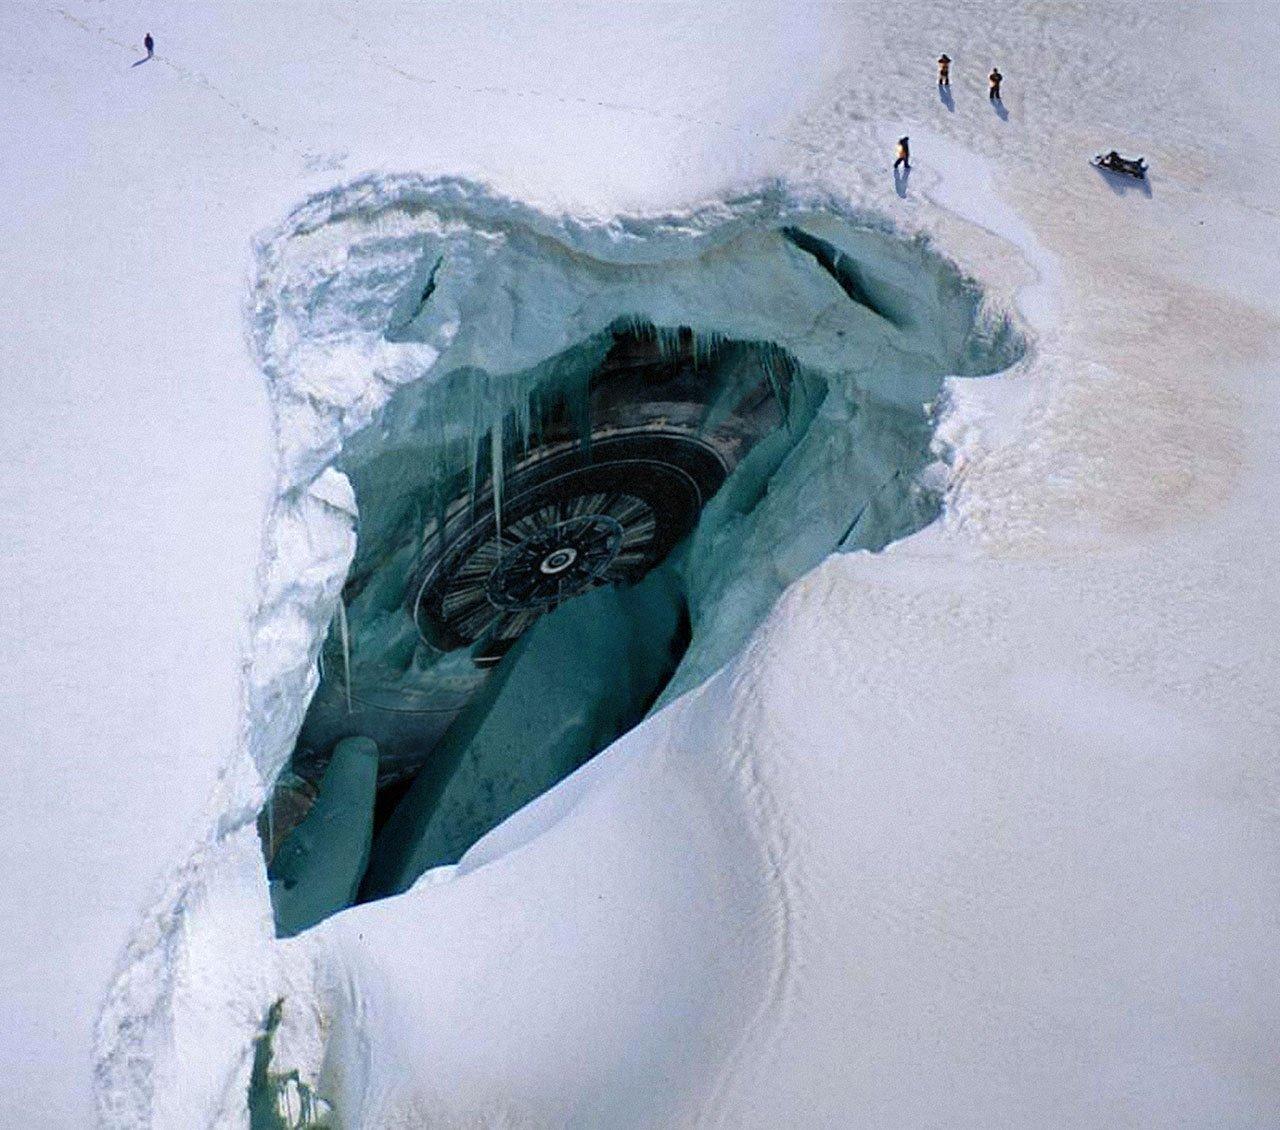 Картинки по запросу нло в антарктиде